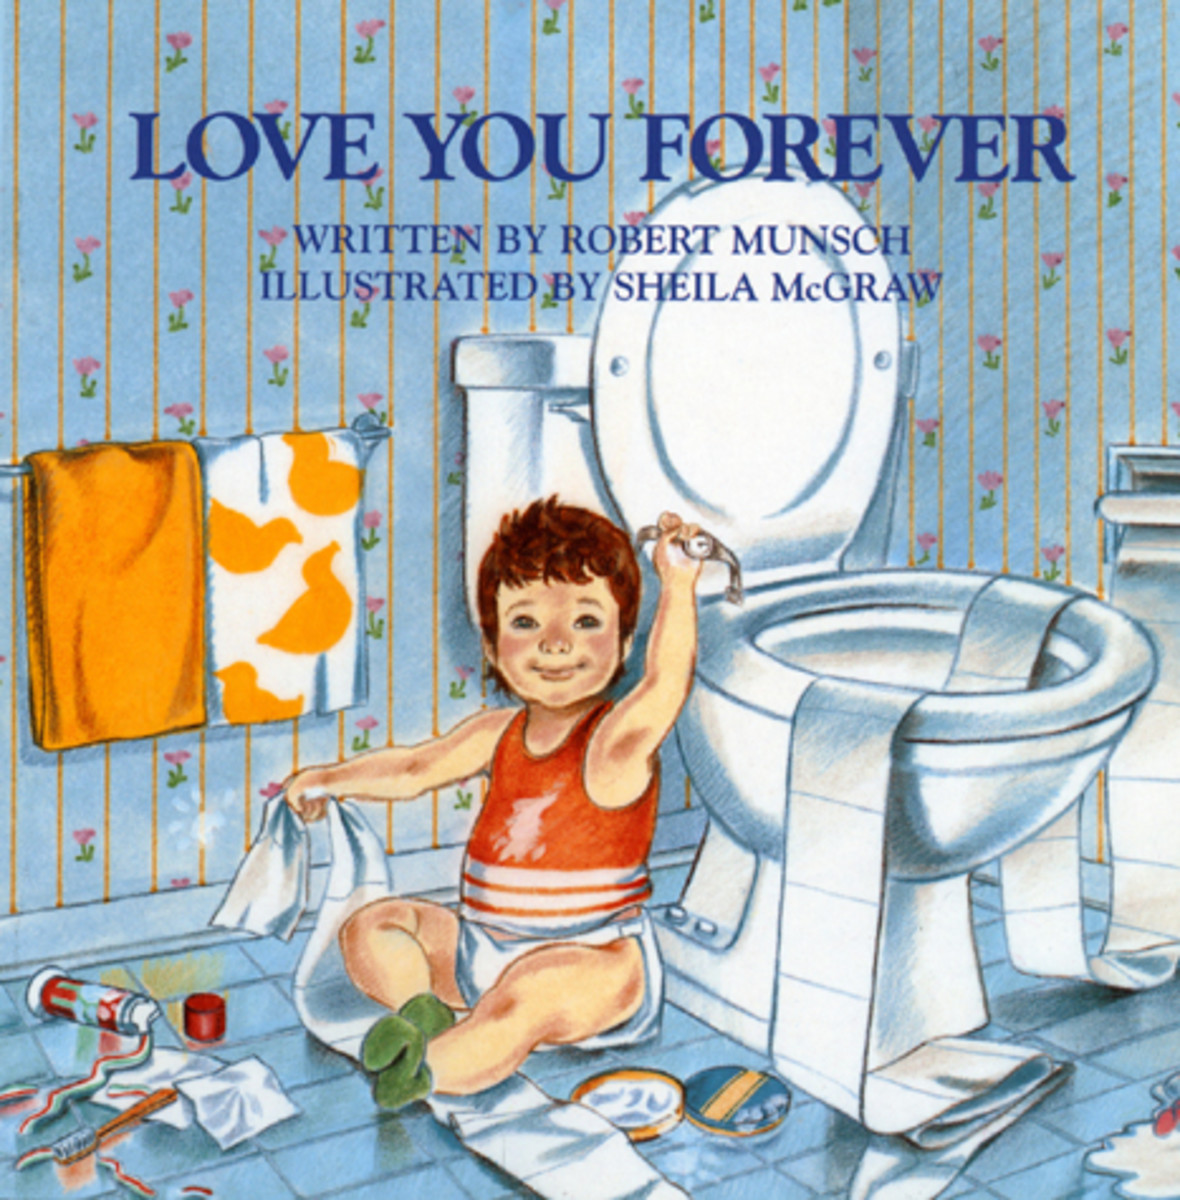 Love You Forever, by Robert Munsch